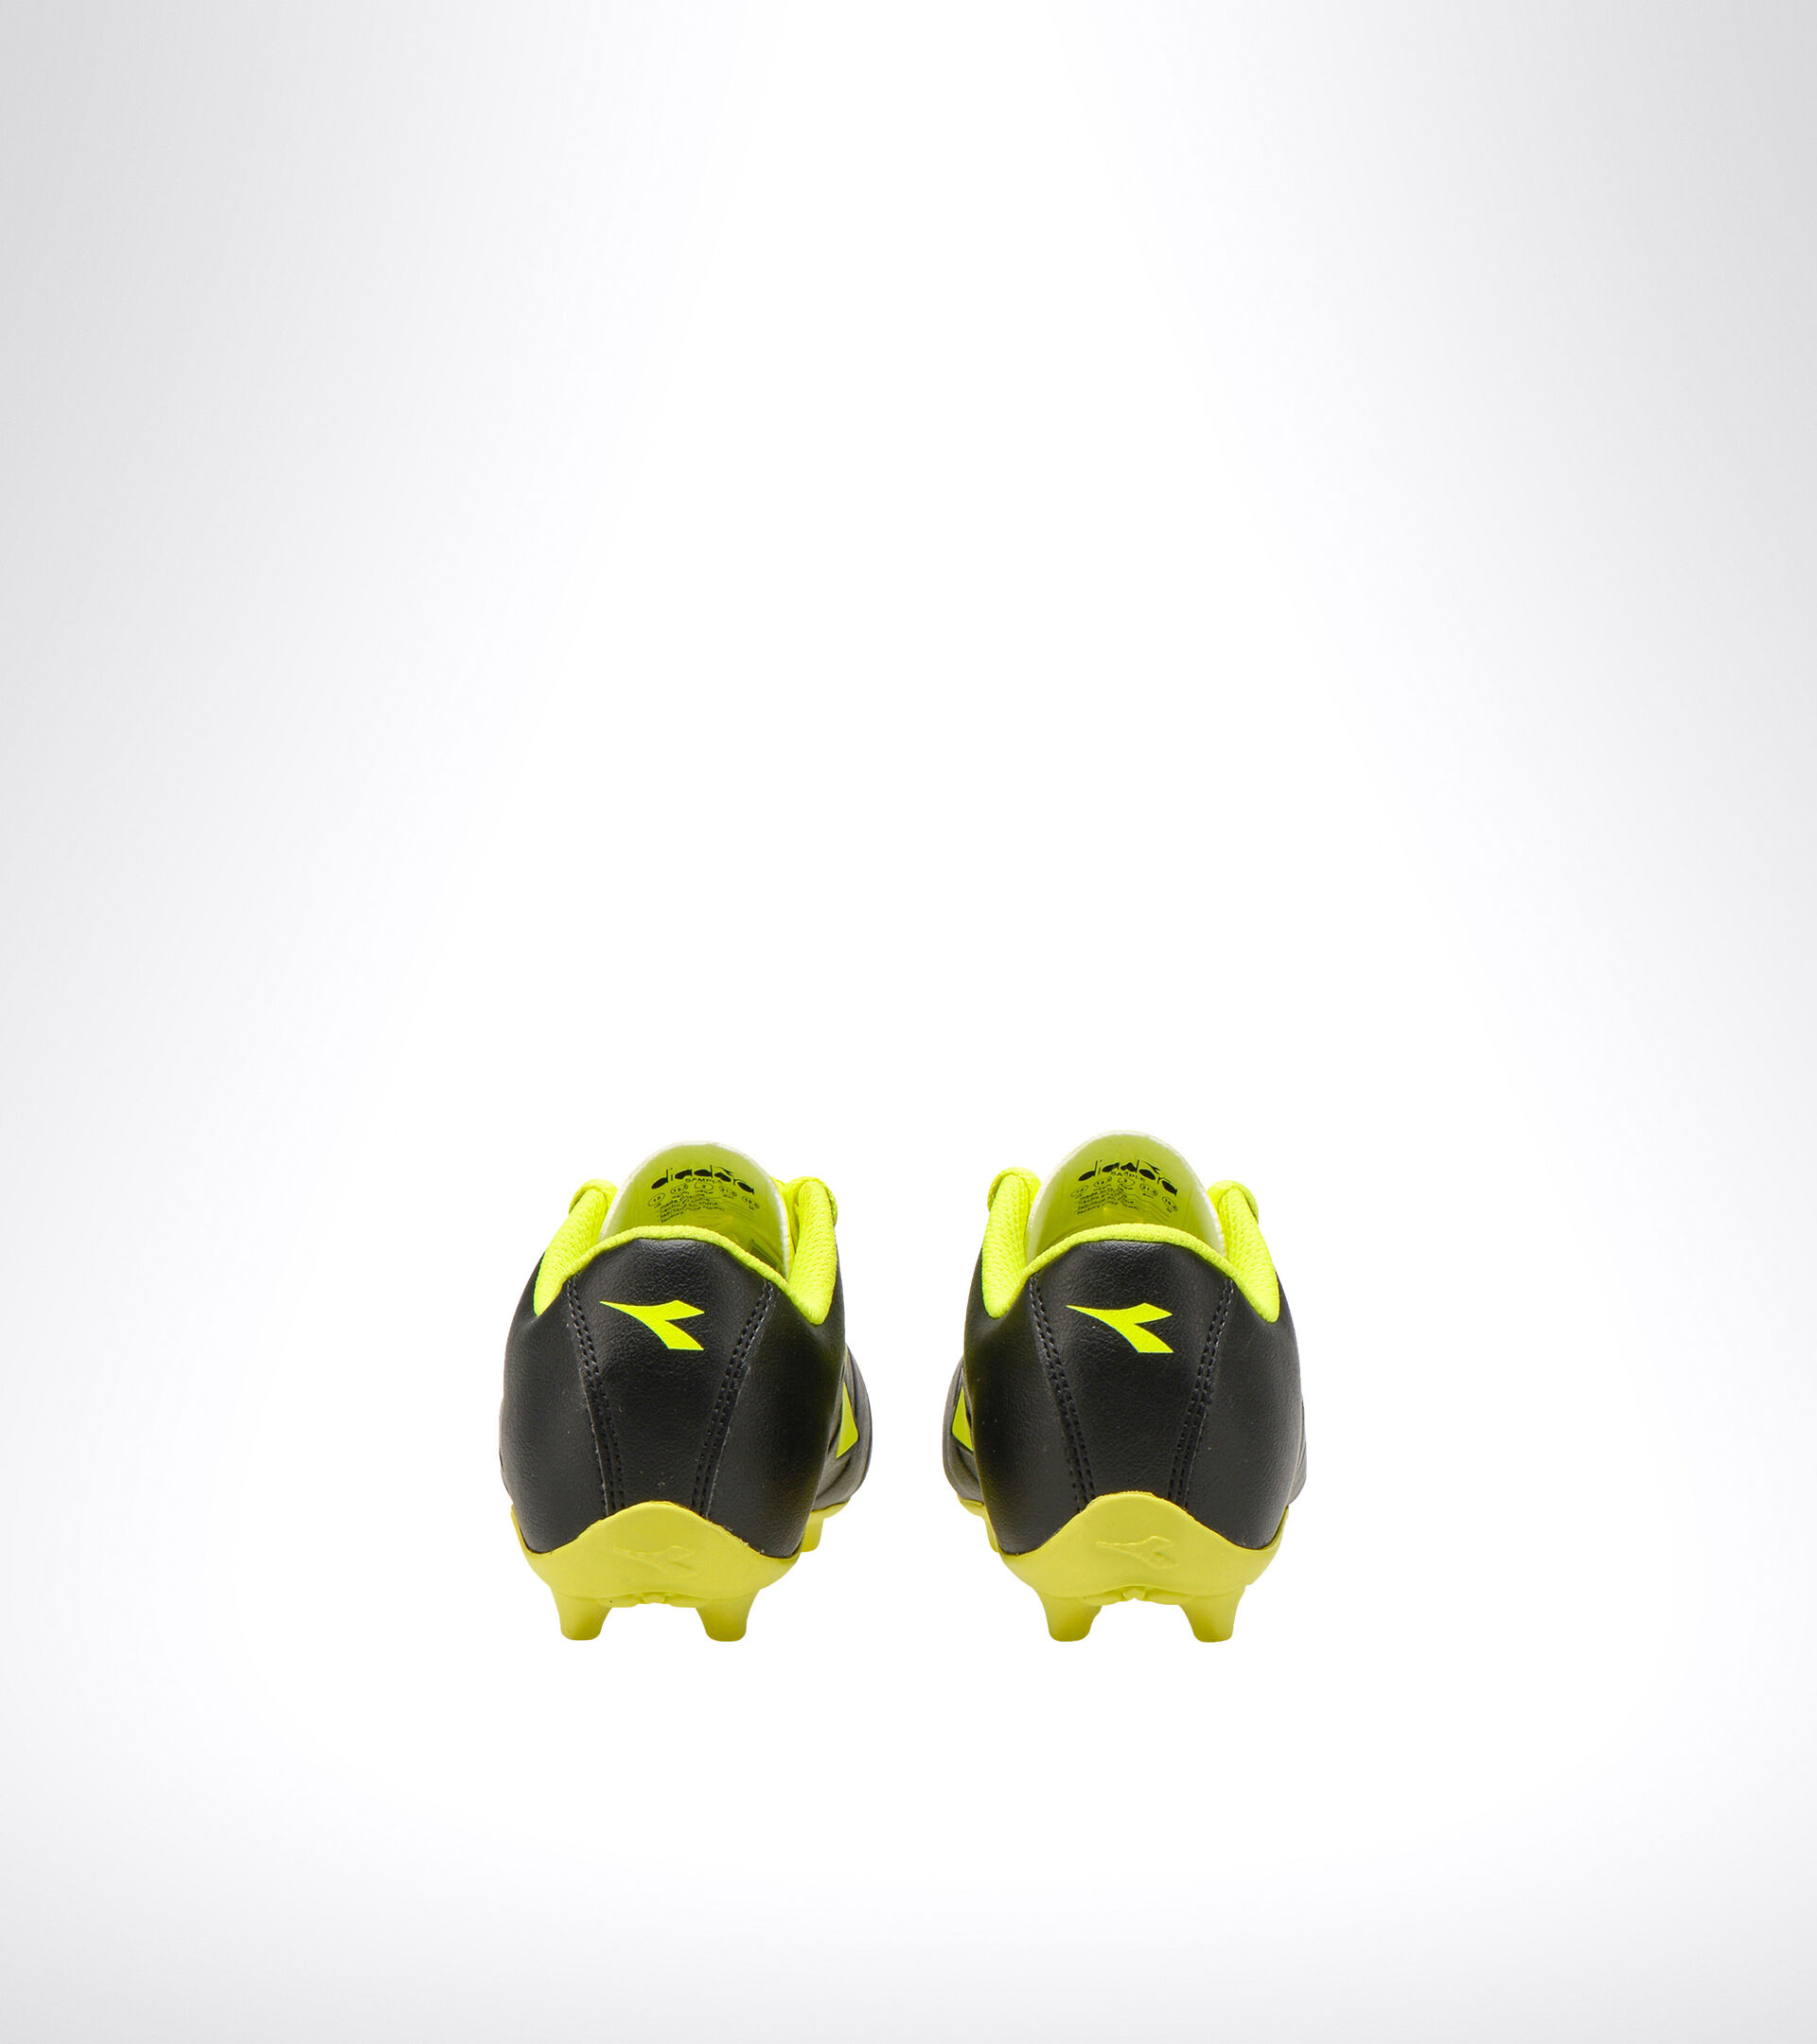 Footwear Sport BAMBINO PICHICHI 3 MD JR BLACK/FLUO YELLOW DIADORA Diadora